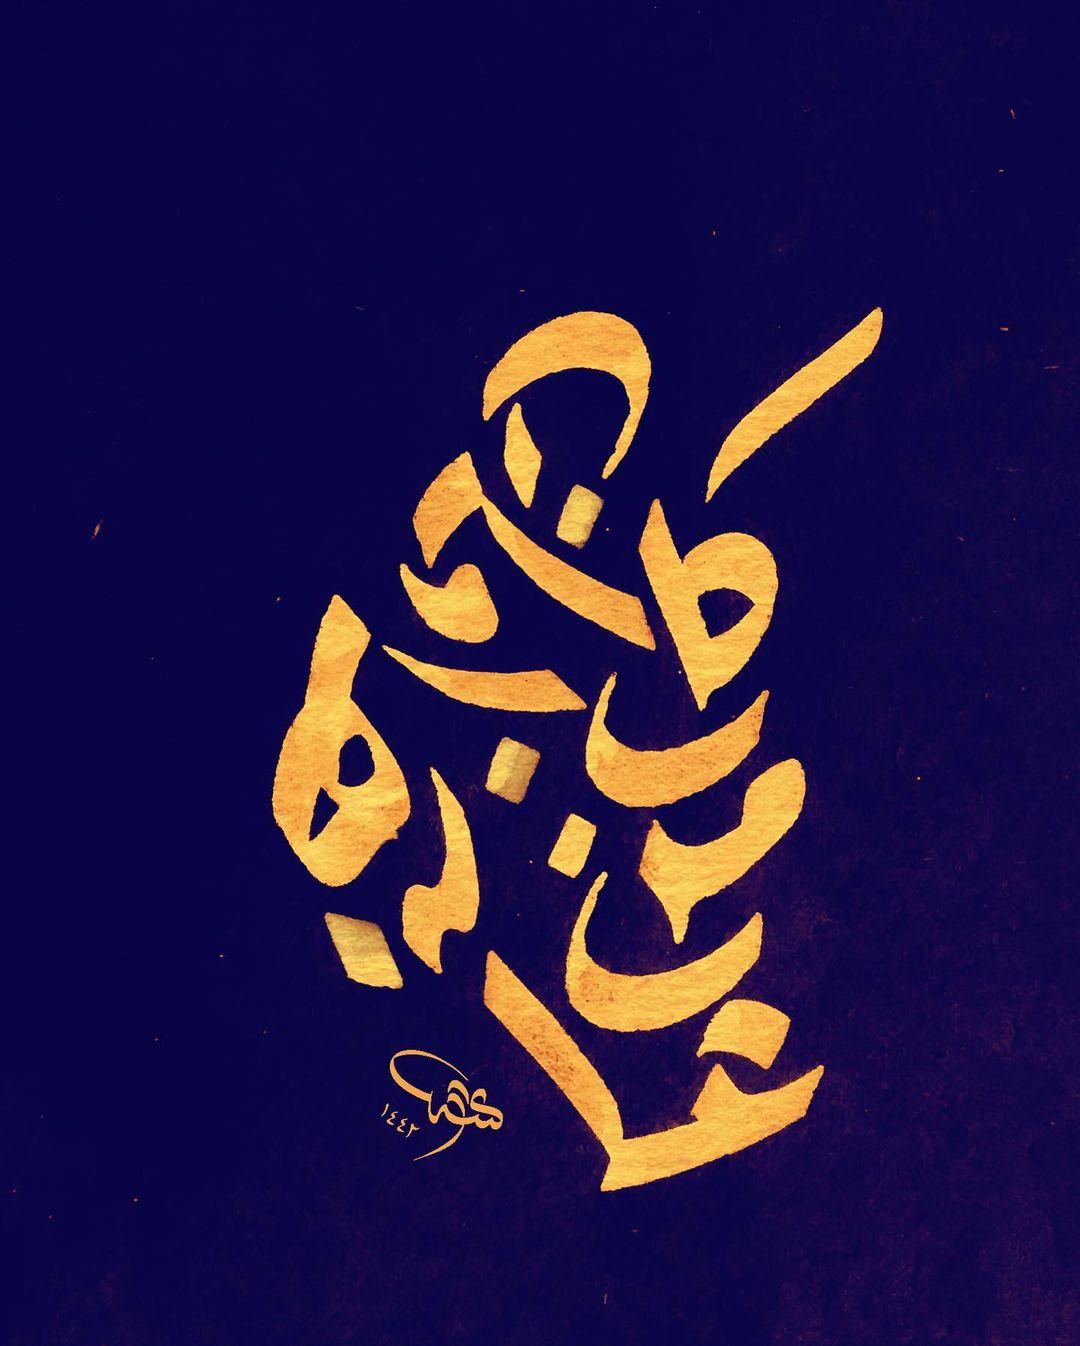 Donwload Photo كل من عليها فان Rahman 26 سورةالرحمن #arabiccalligraphy #islamiccalligraphy #tez...- hattat_aa 2